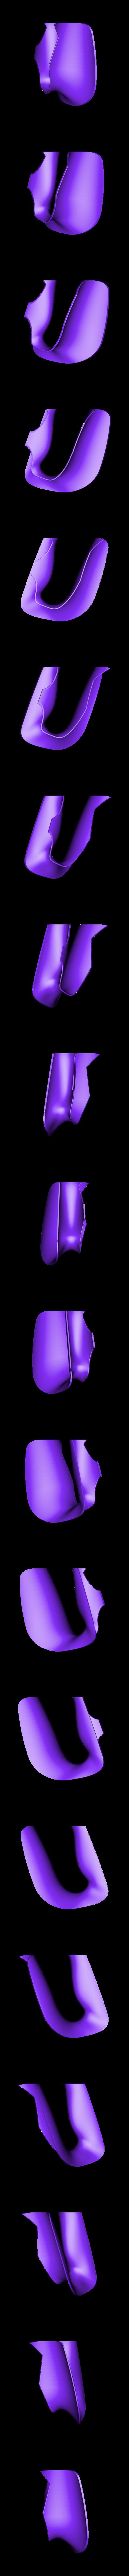 Blender_Handle_overmold.STL Download free STL file Hand Mixer • 3D printable design, alterboy987